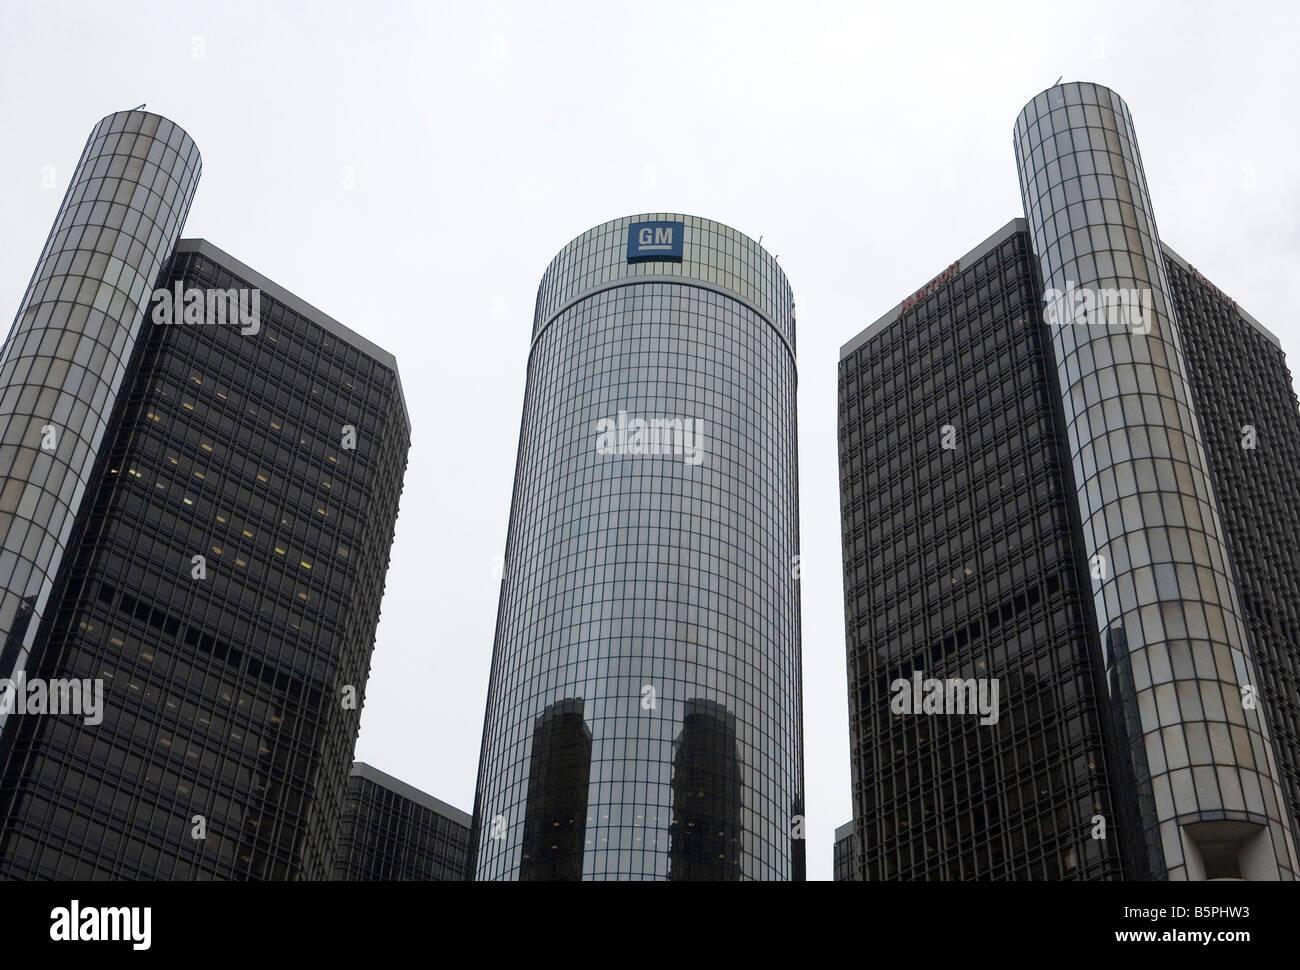 General Motors World Headquarters in Detroit, Michigan. - Stock Image